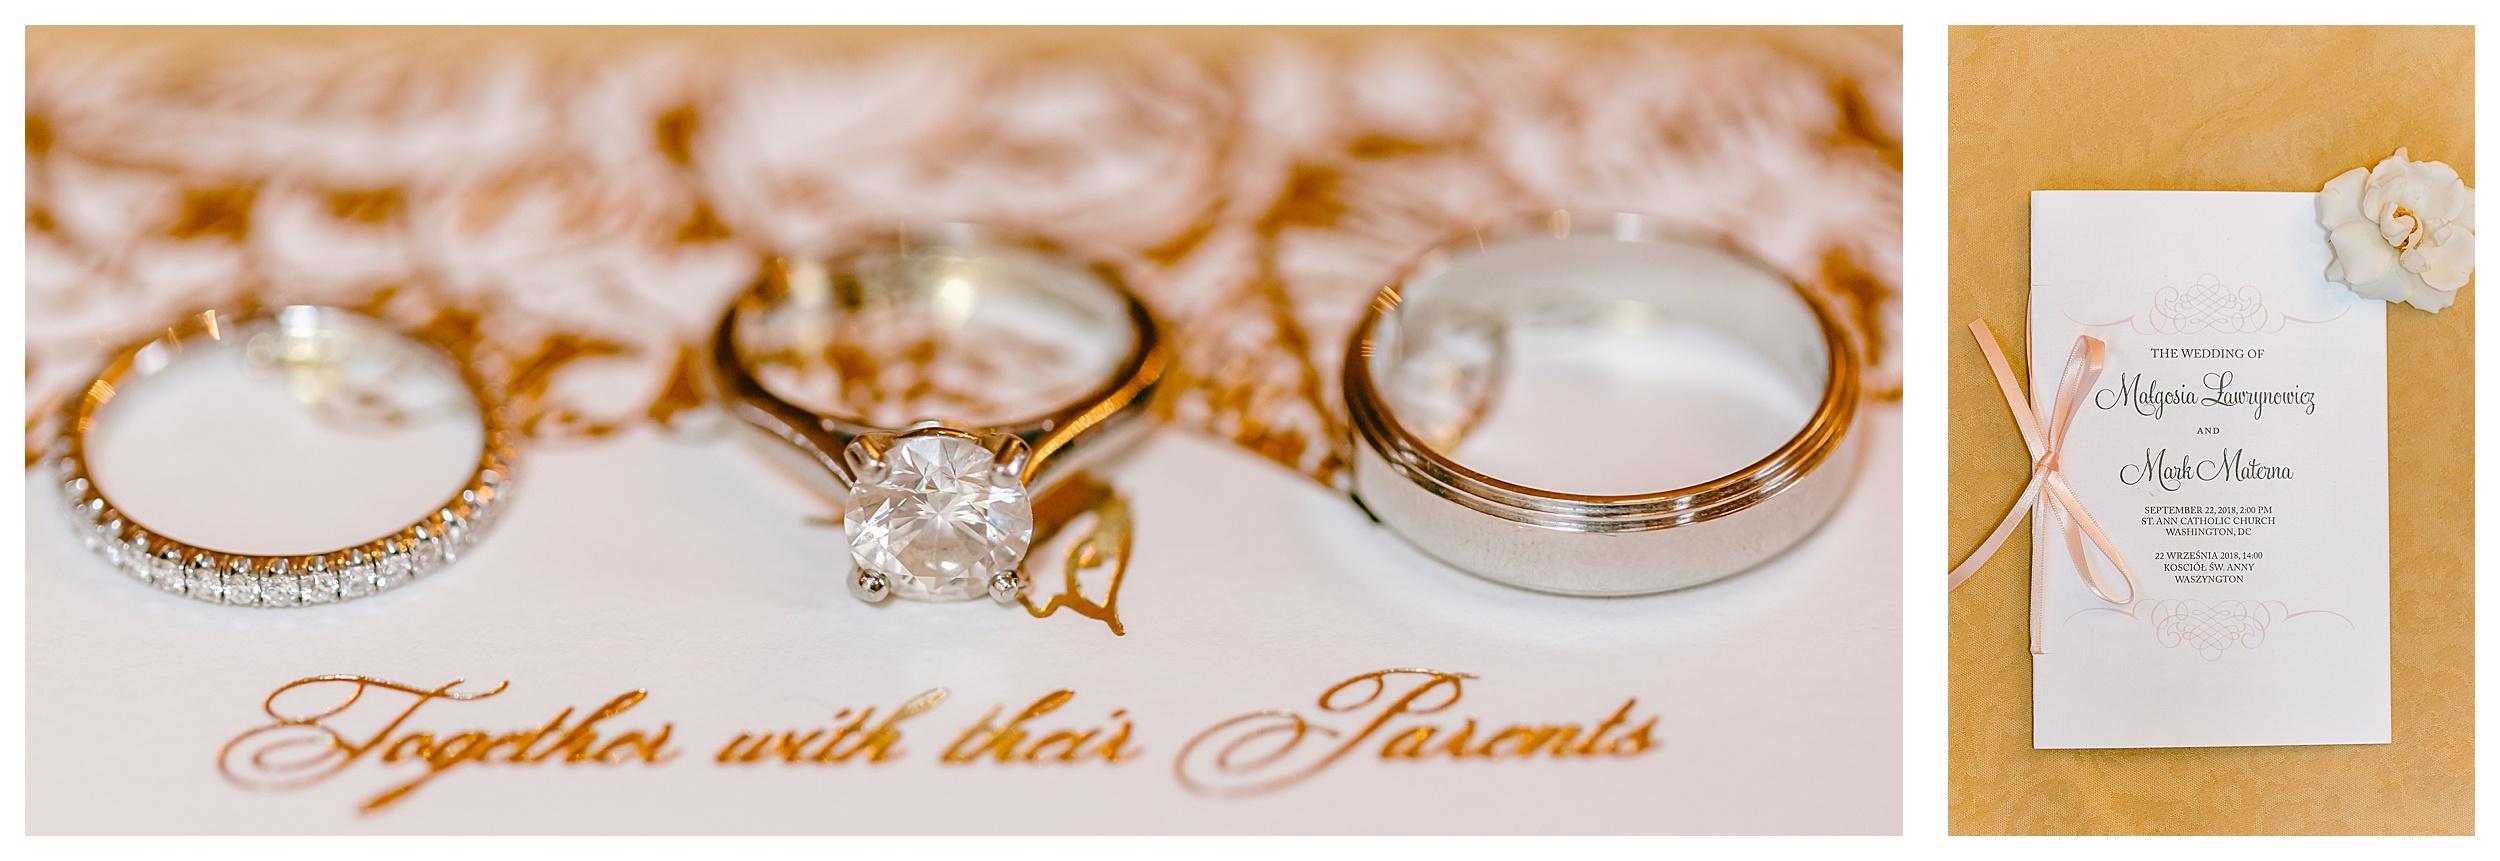 ring shot macro close up gold cartier wedding band